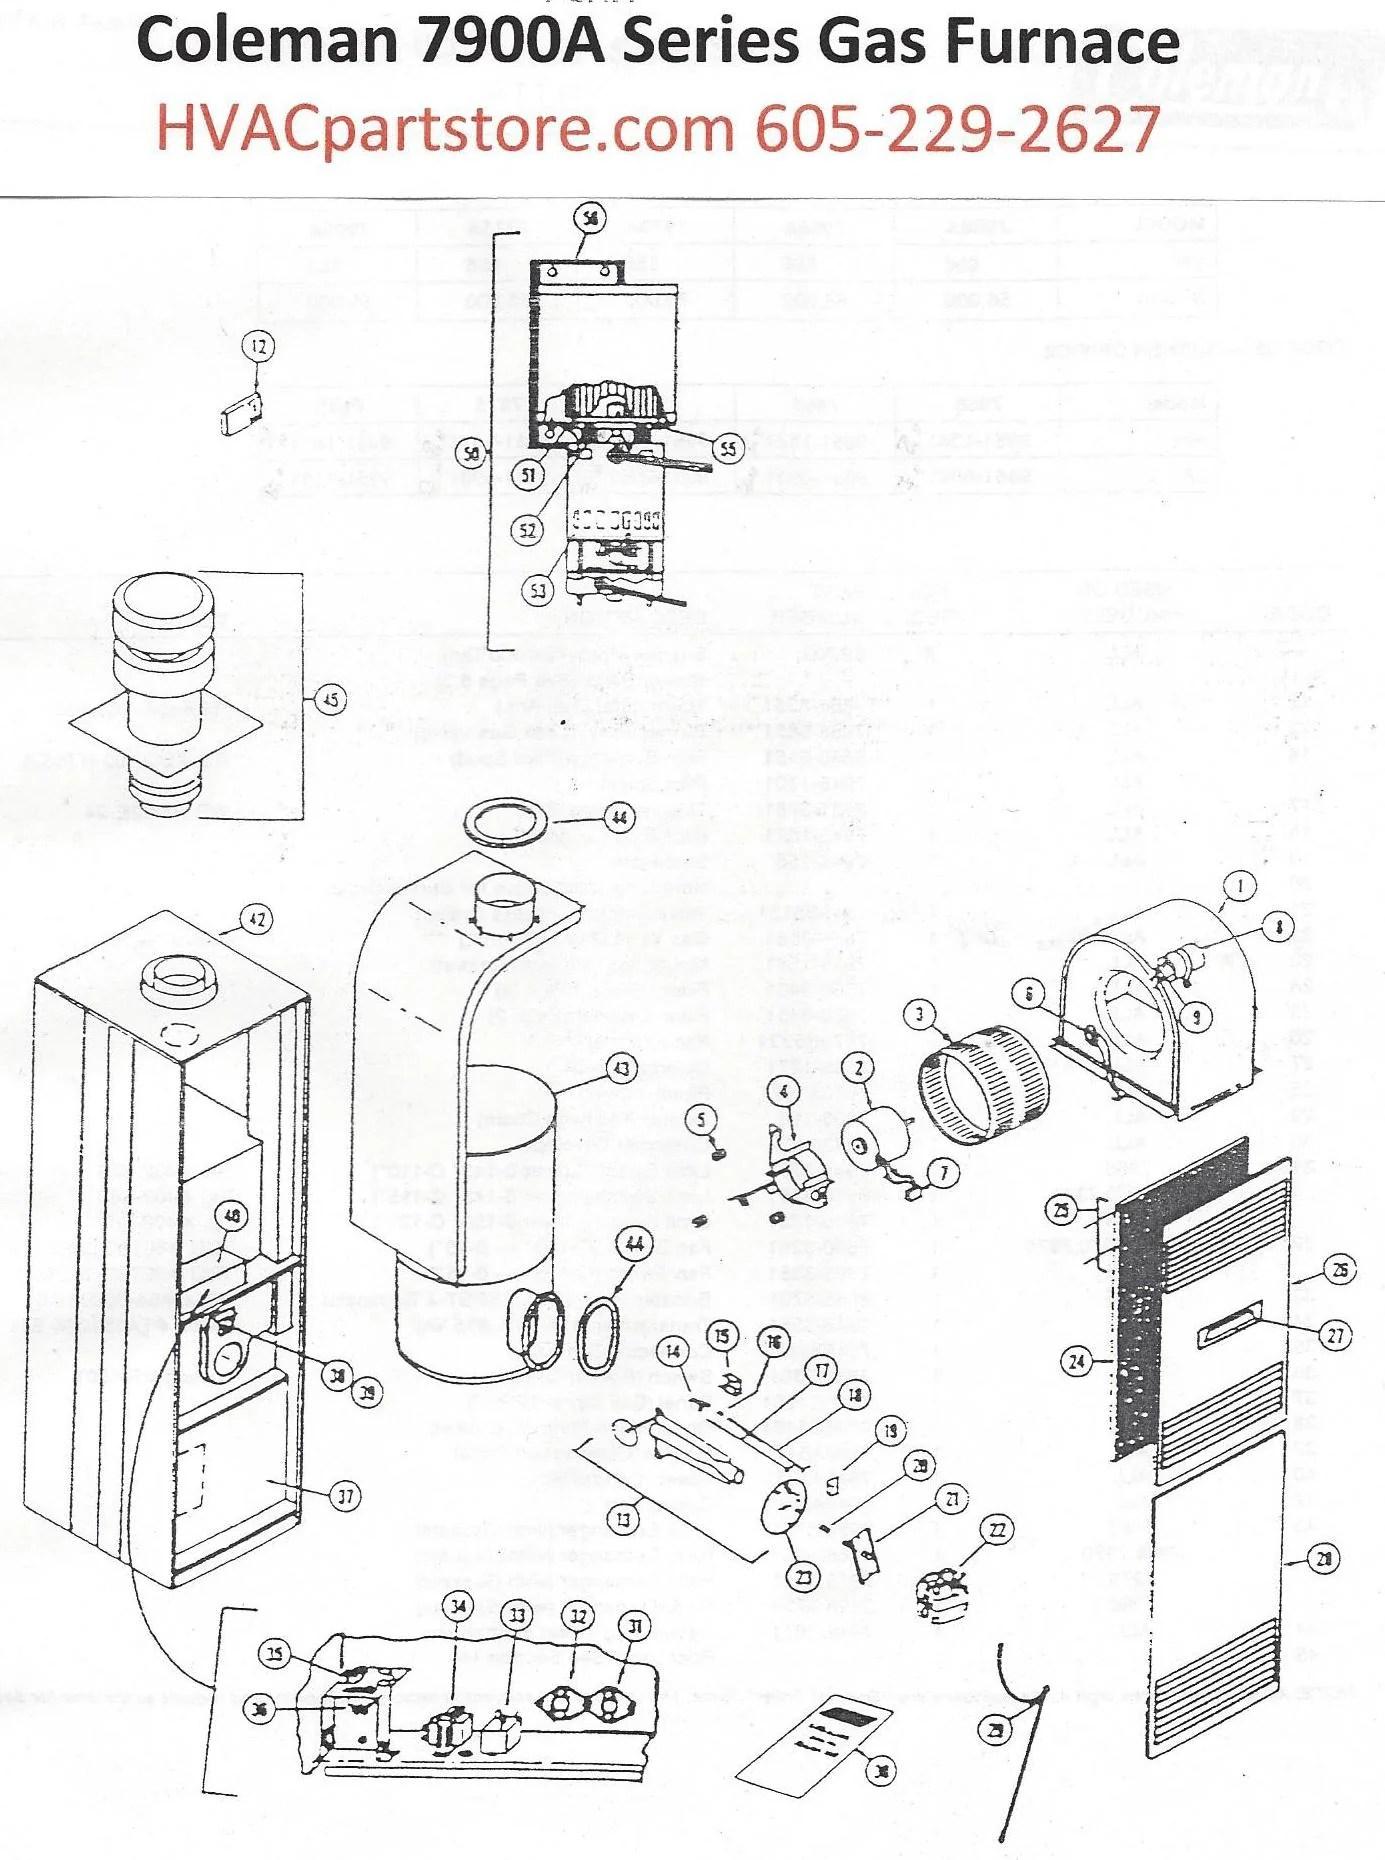 7600b coleman gas furnace diagram